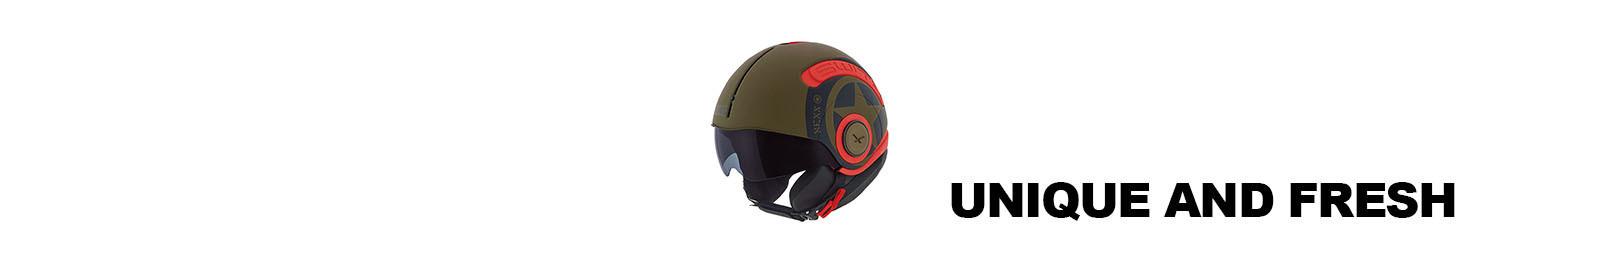 Nexx SX10 Helmets